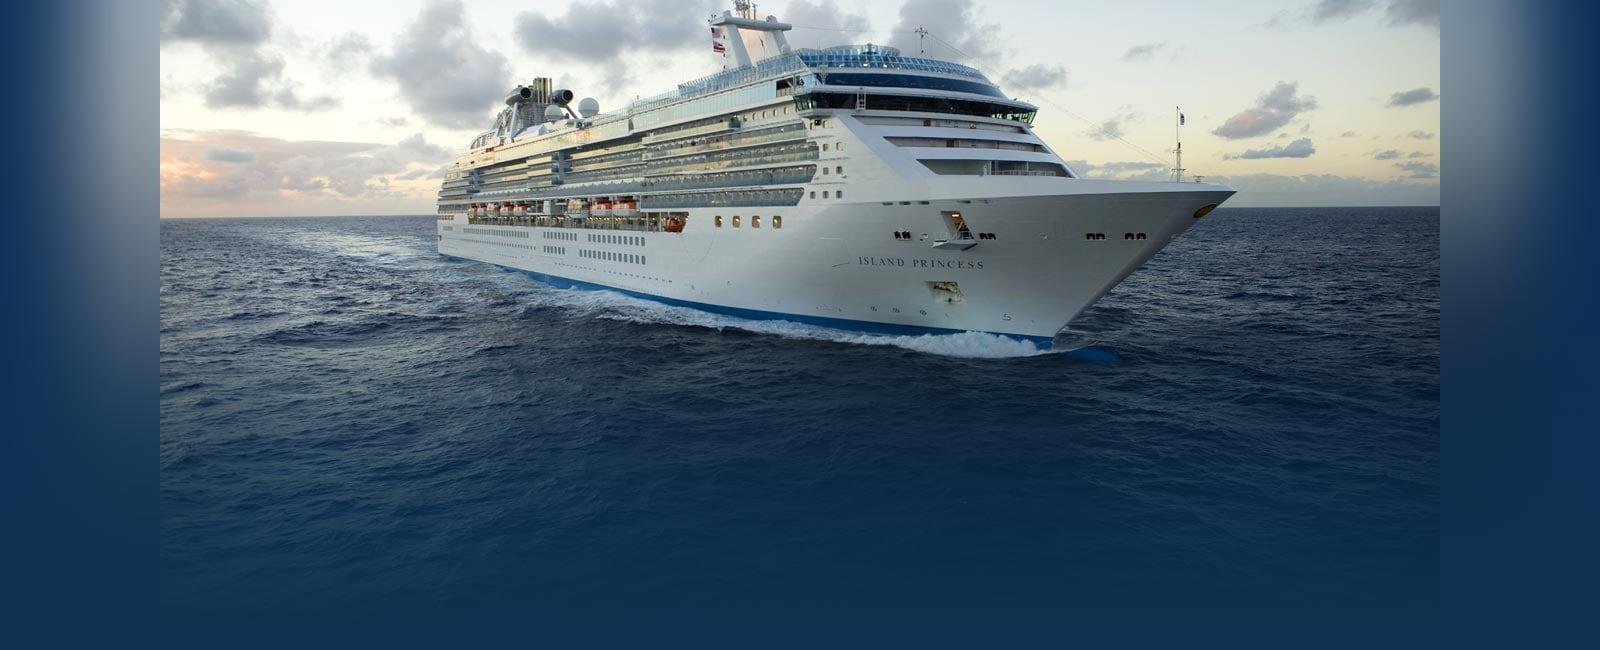 Island Princess Cruise Ship Information Princess Cruises